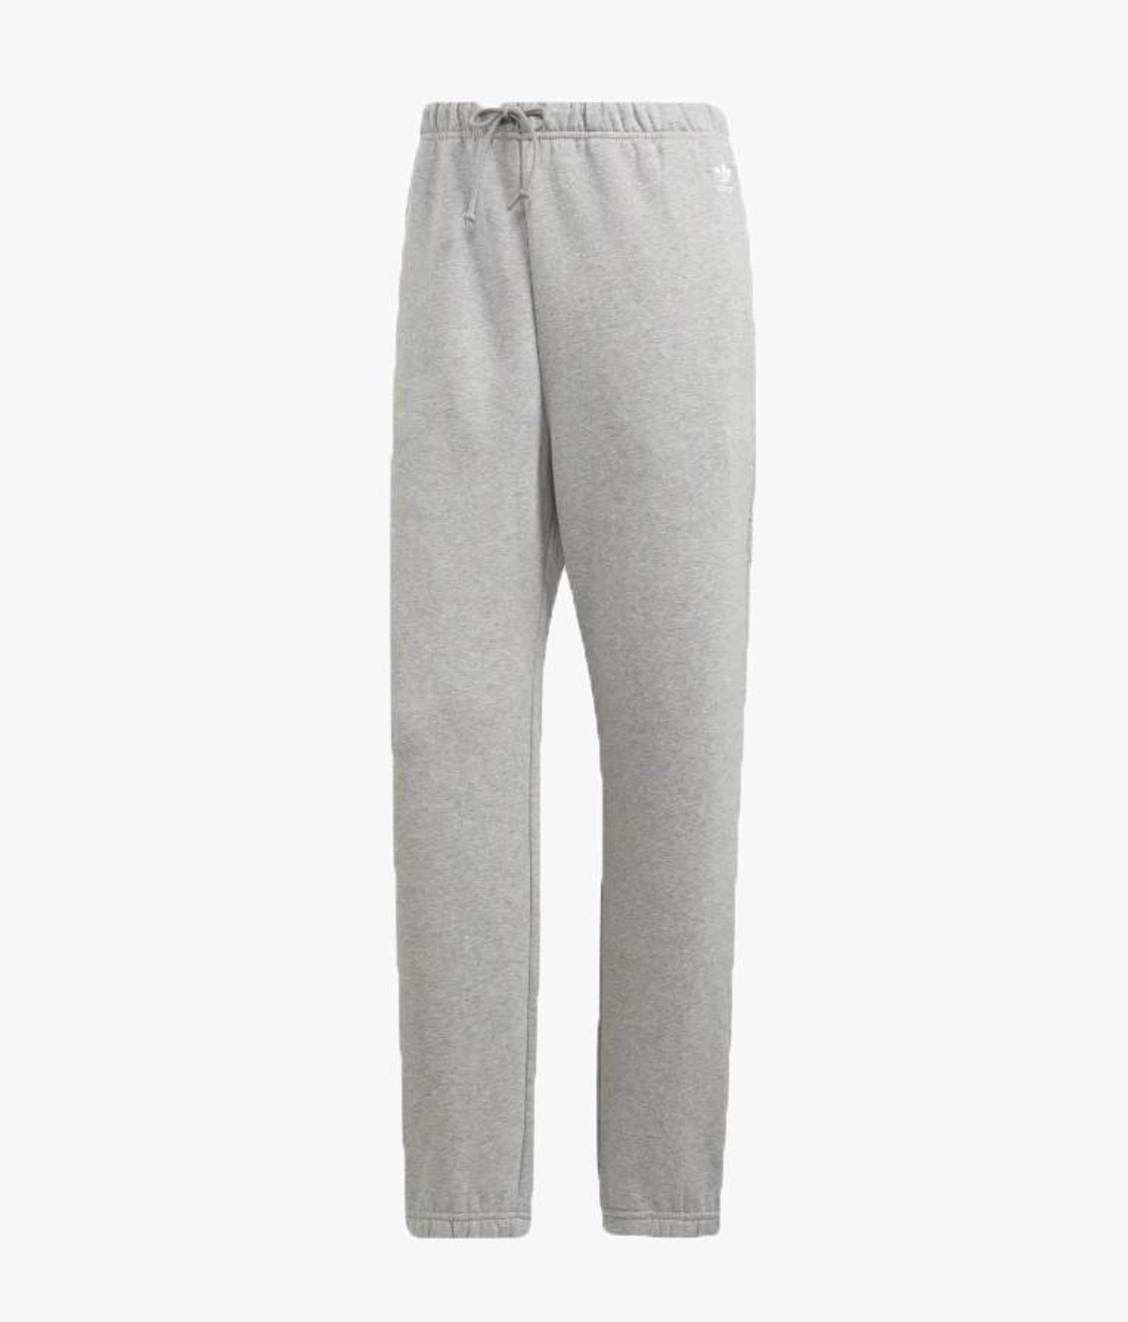 Adidas Adidas SC Sweatpants Grey